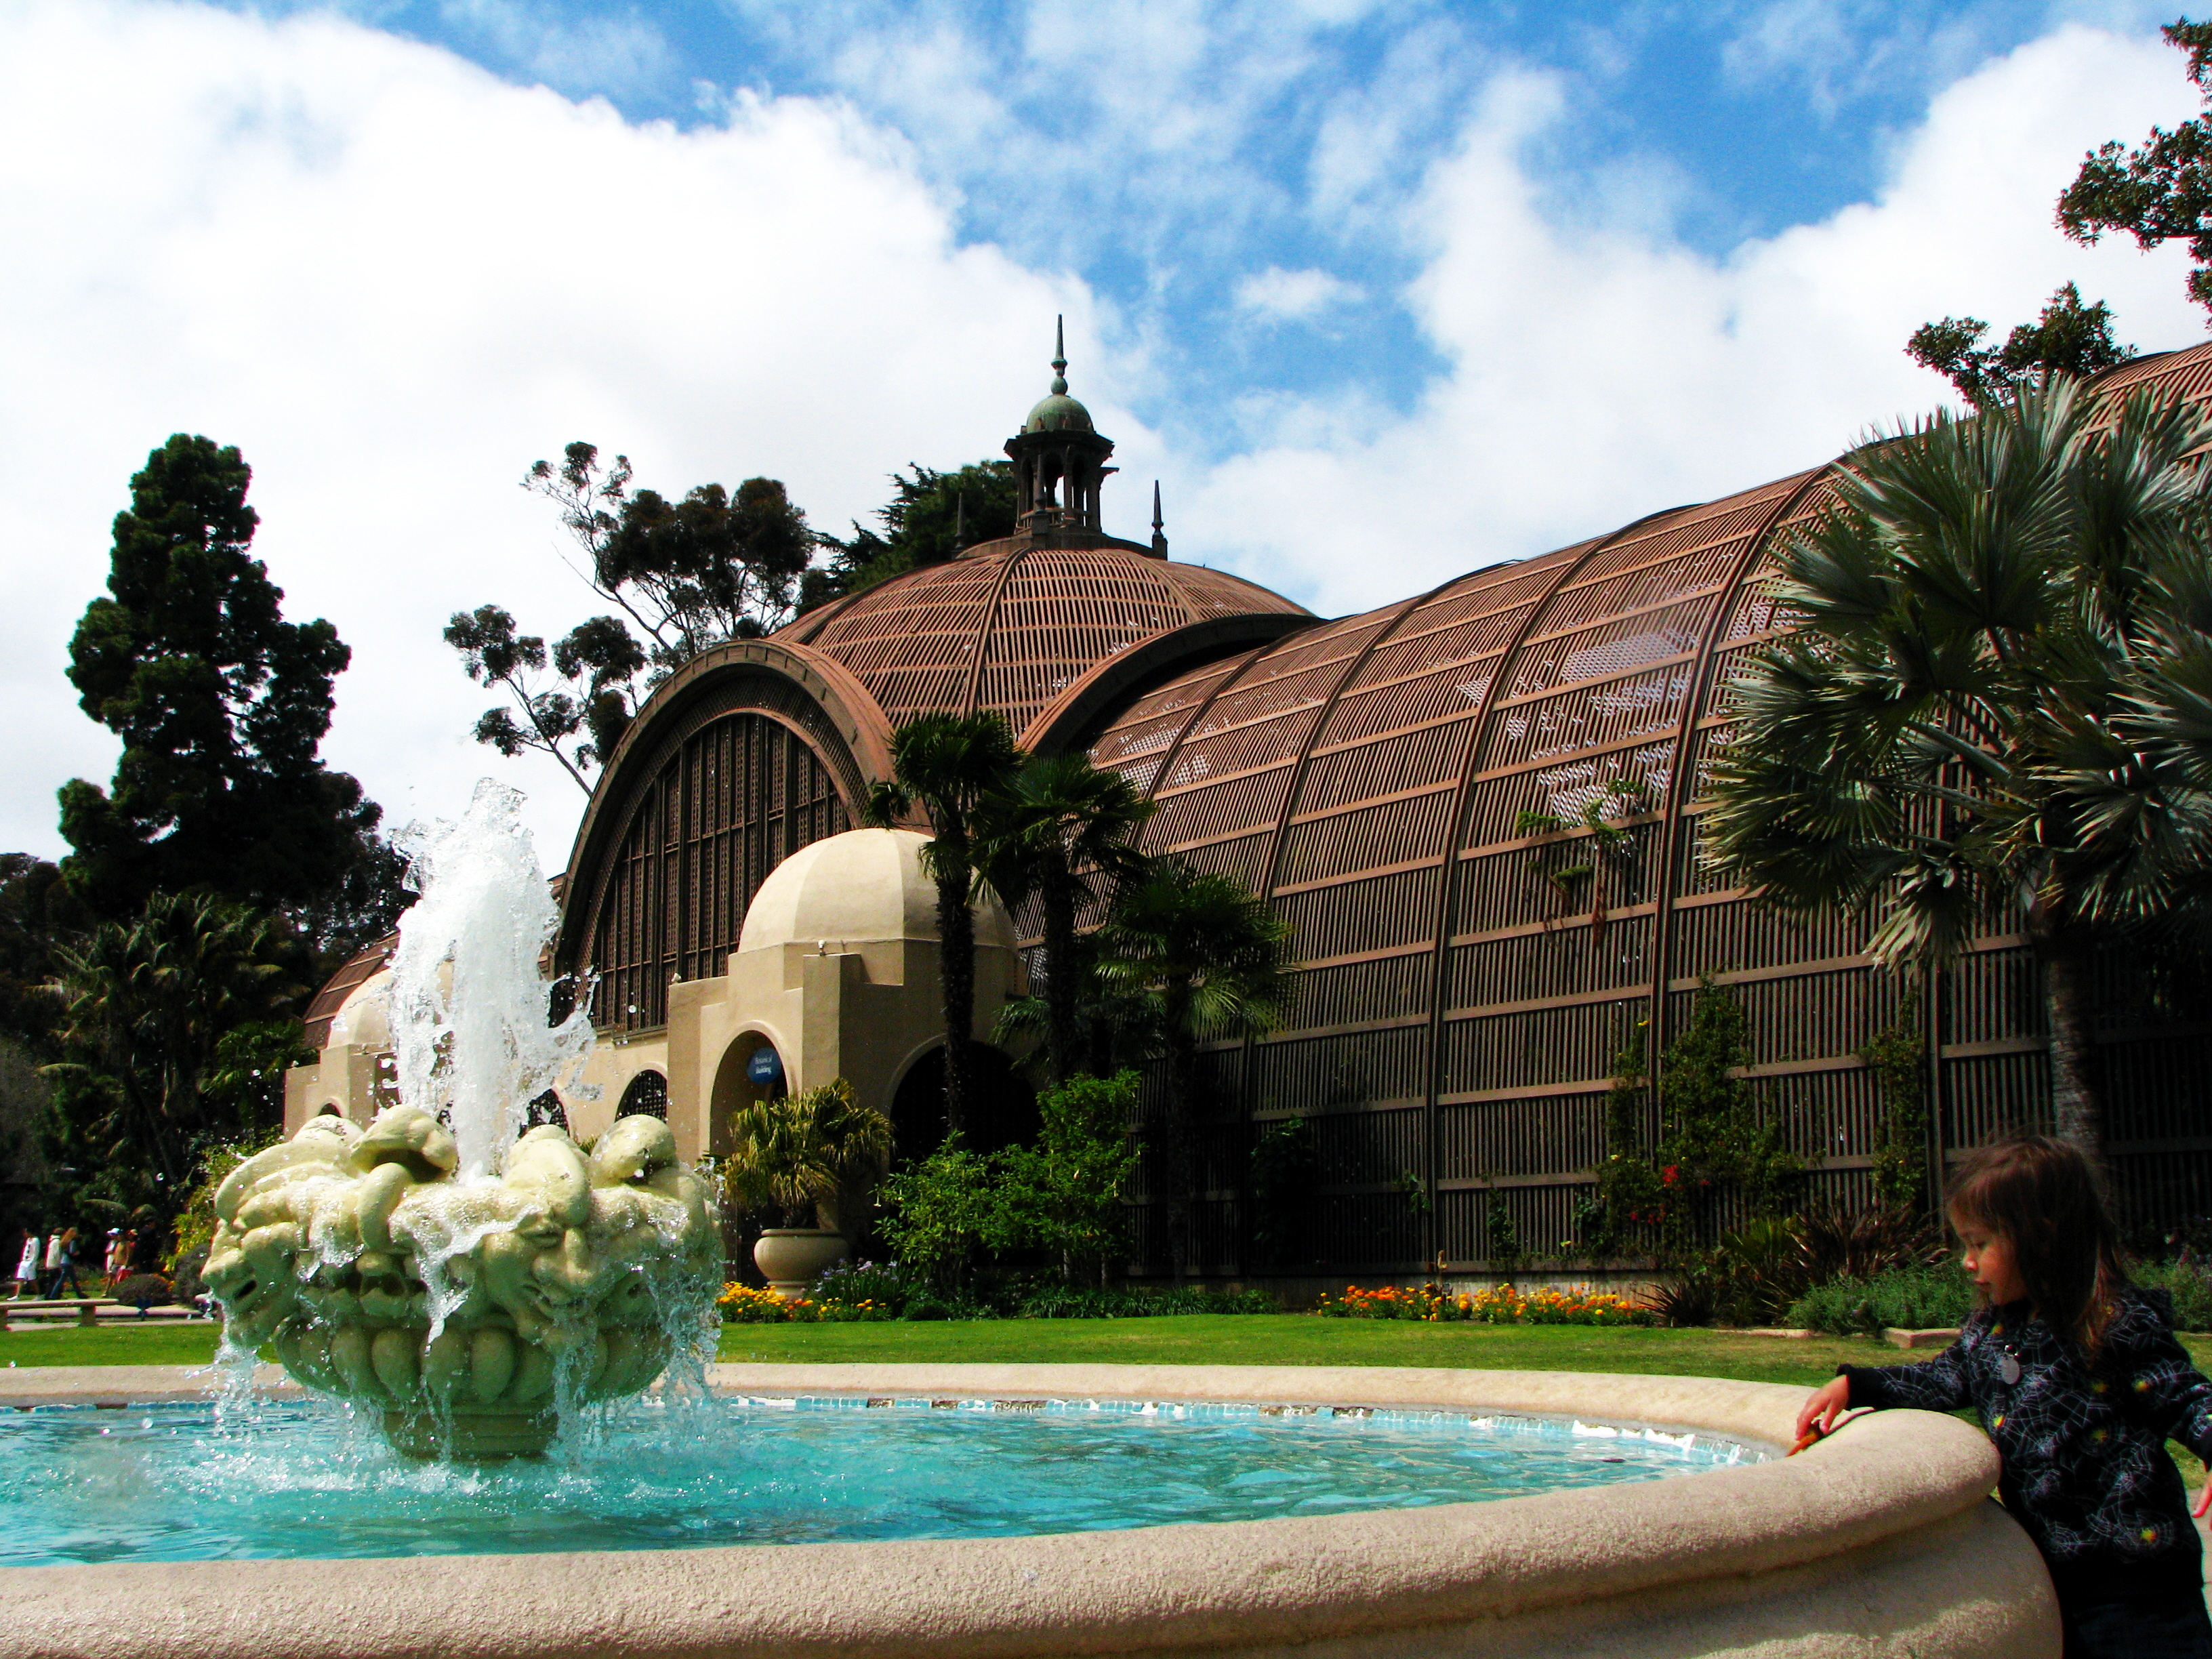 Beau File:Botanical Garden, Balboa Park